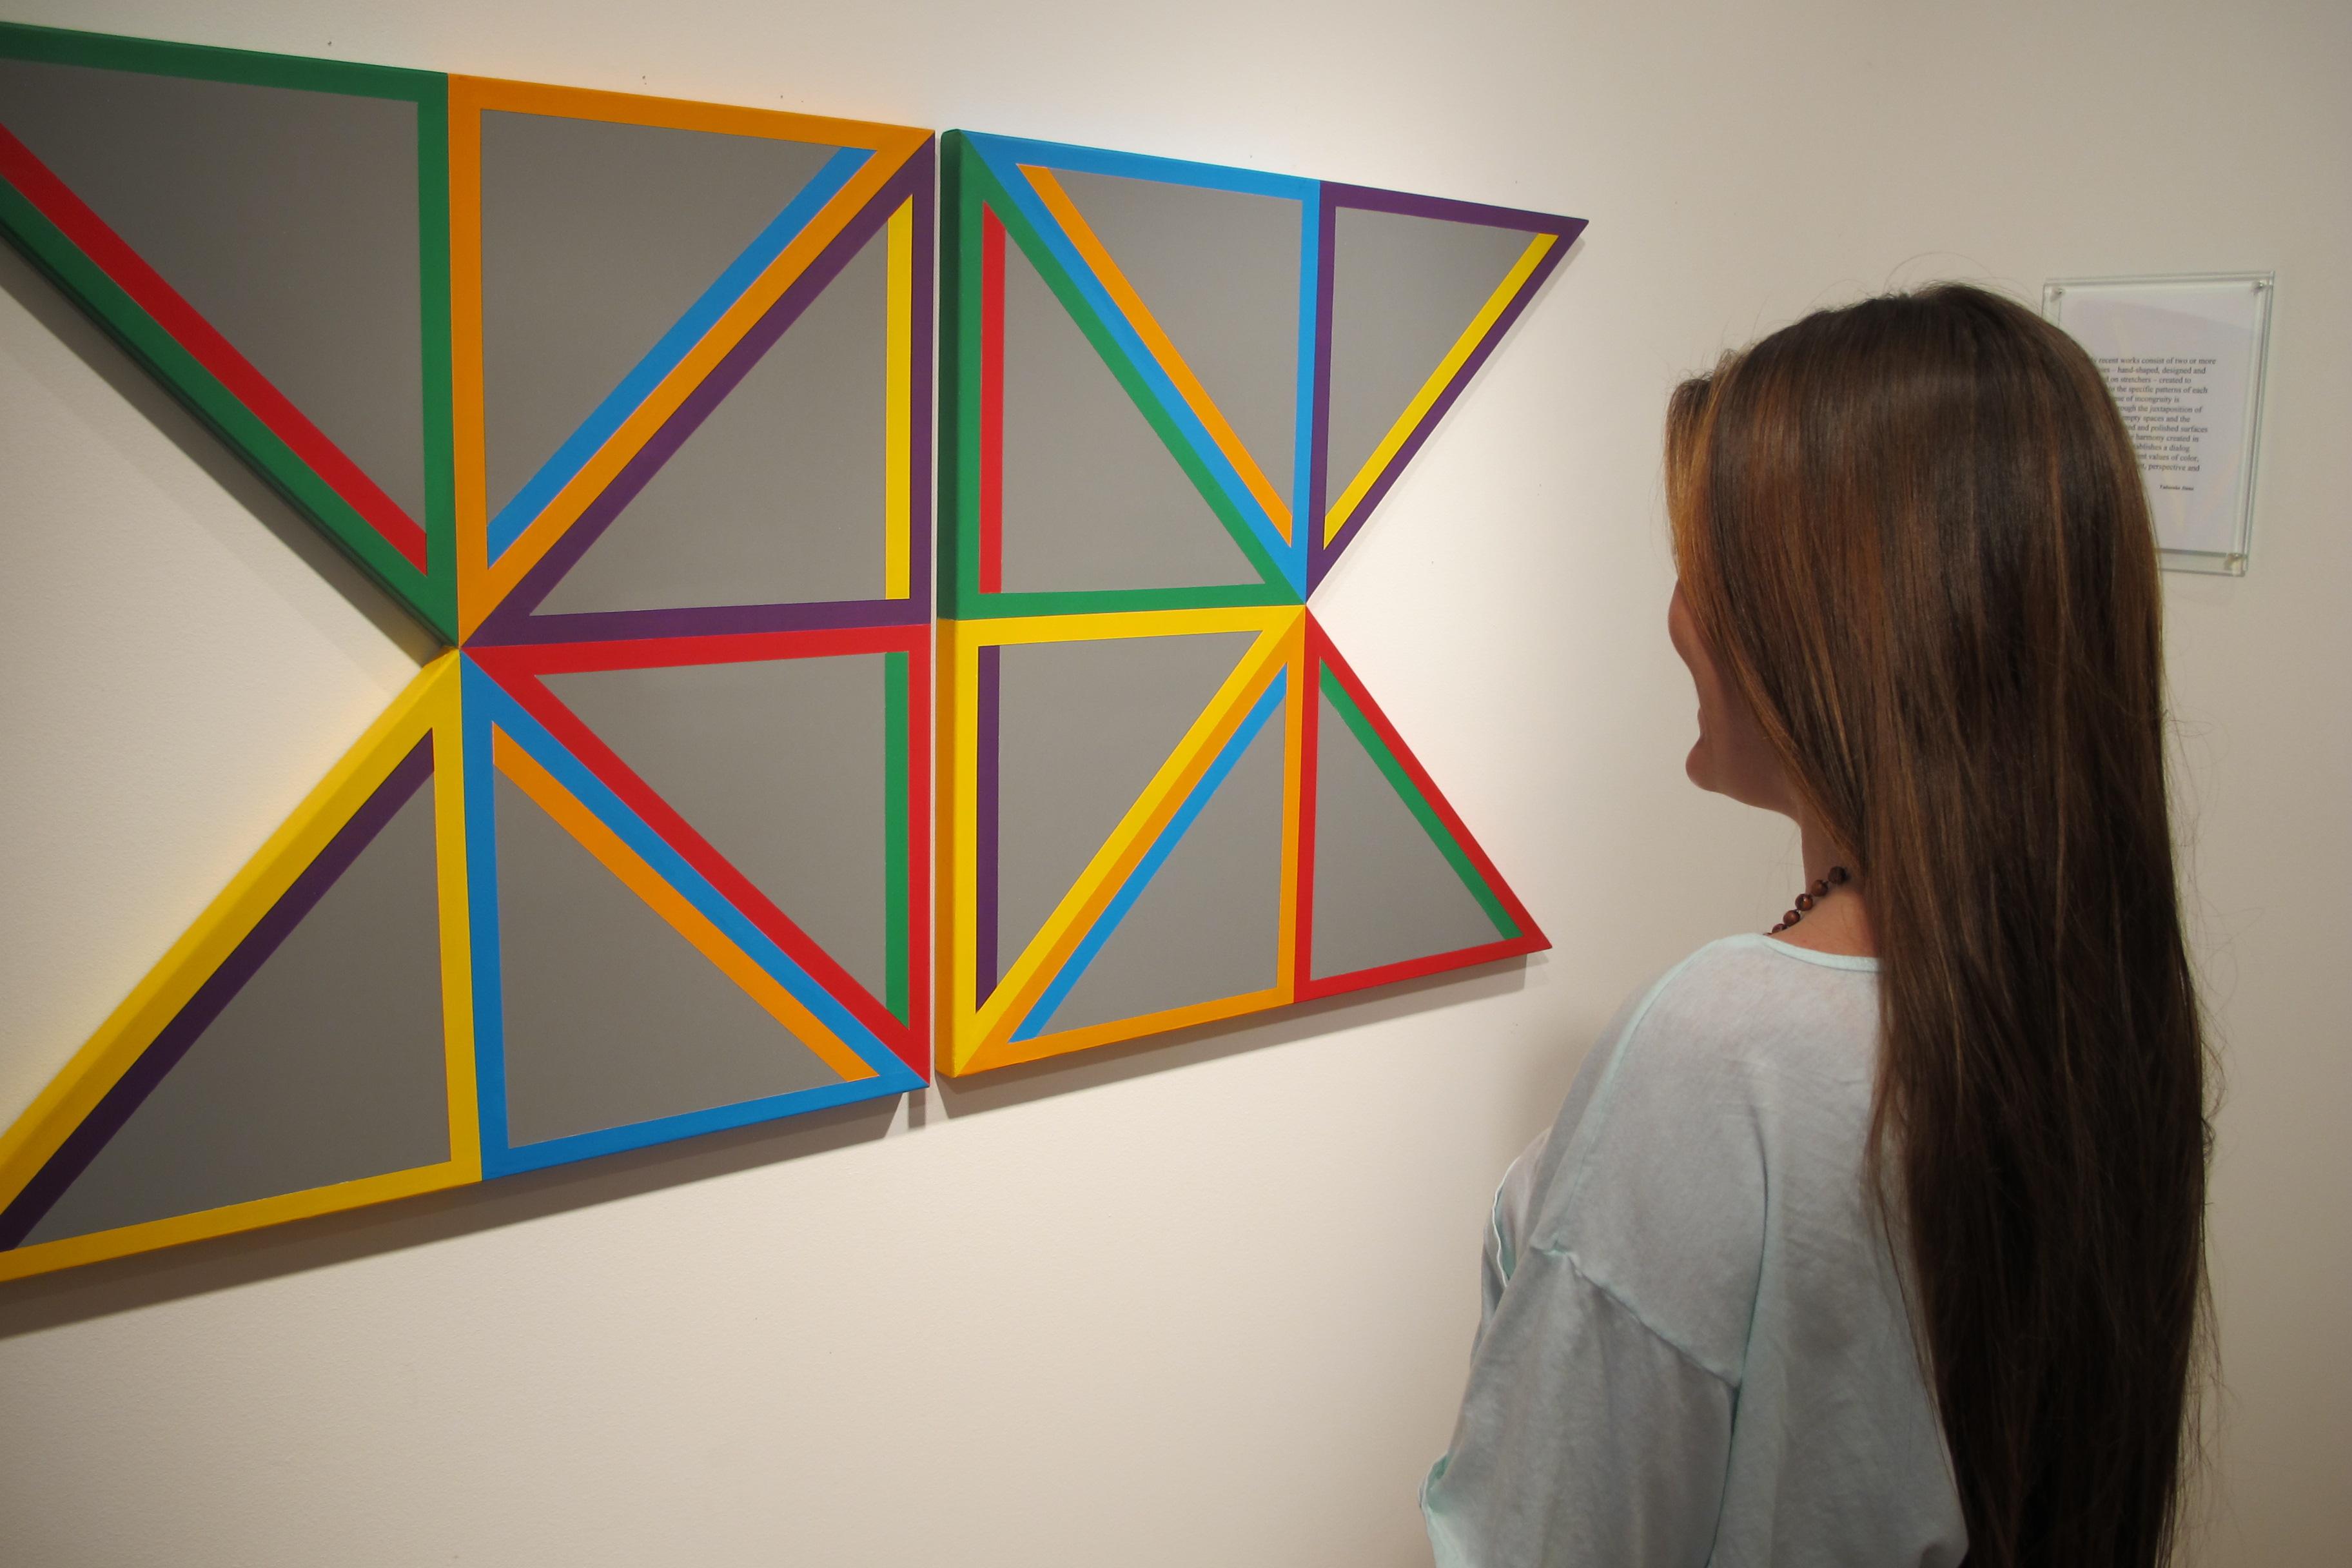 Gray Triangle - Urethane, Acrylic 30x61 inches